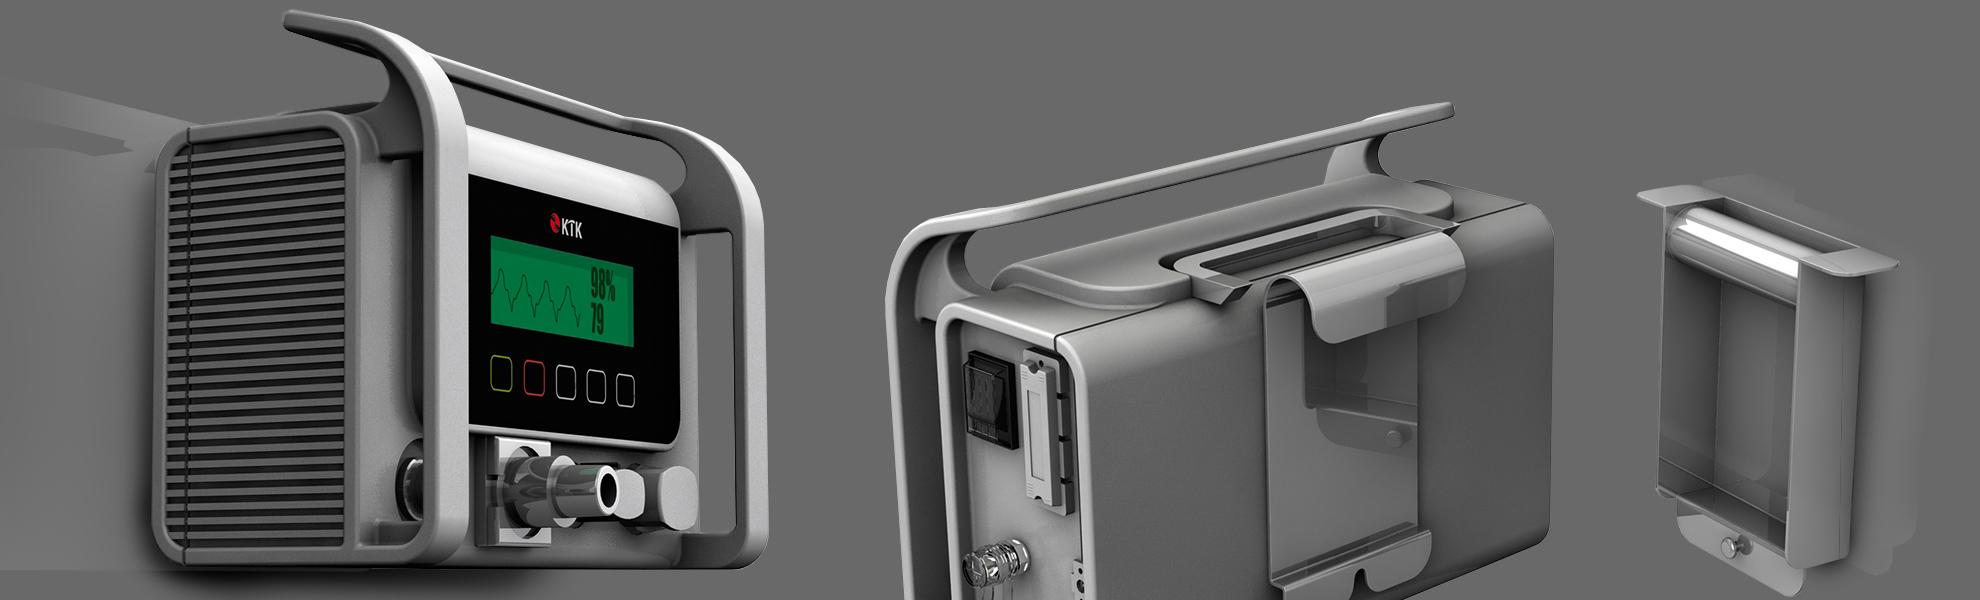 chelles-e-hayashi-design-portfolio-ktk-ventilador-pulmonar-portatil-produto-estrutural